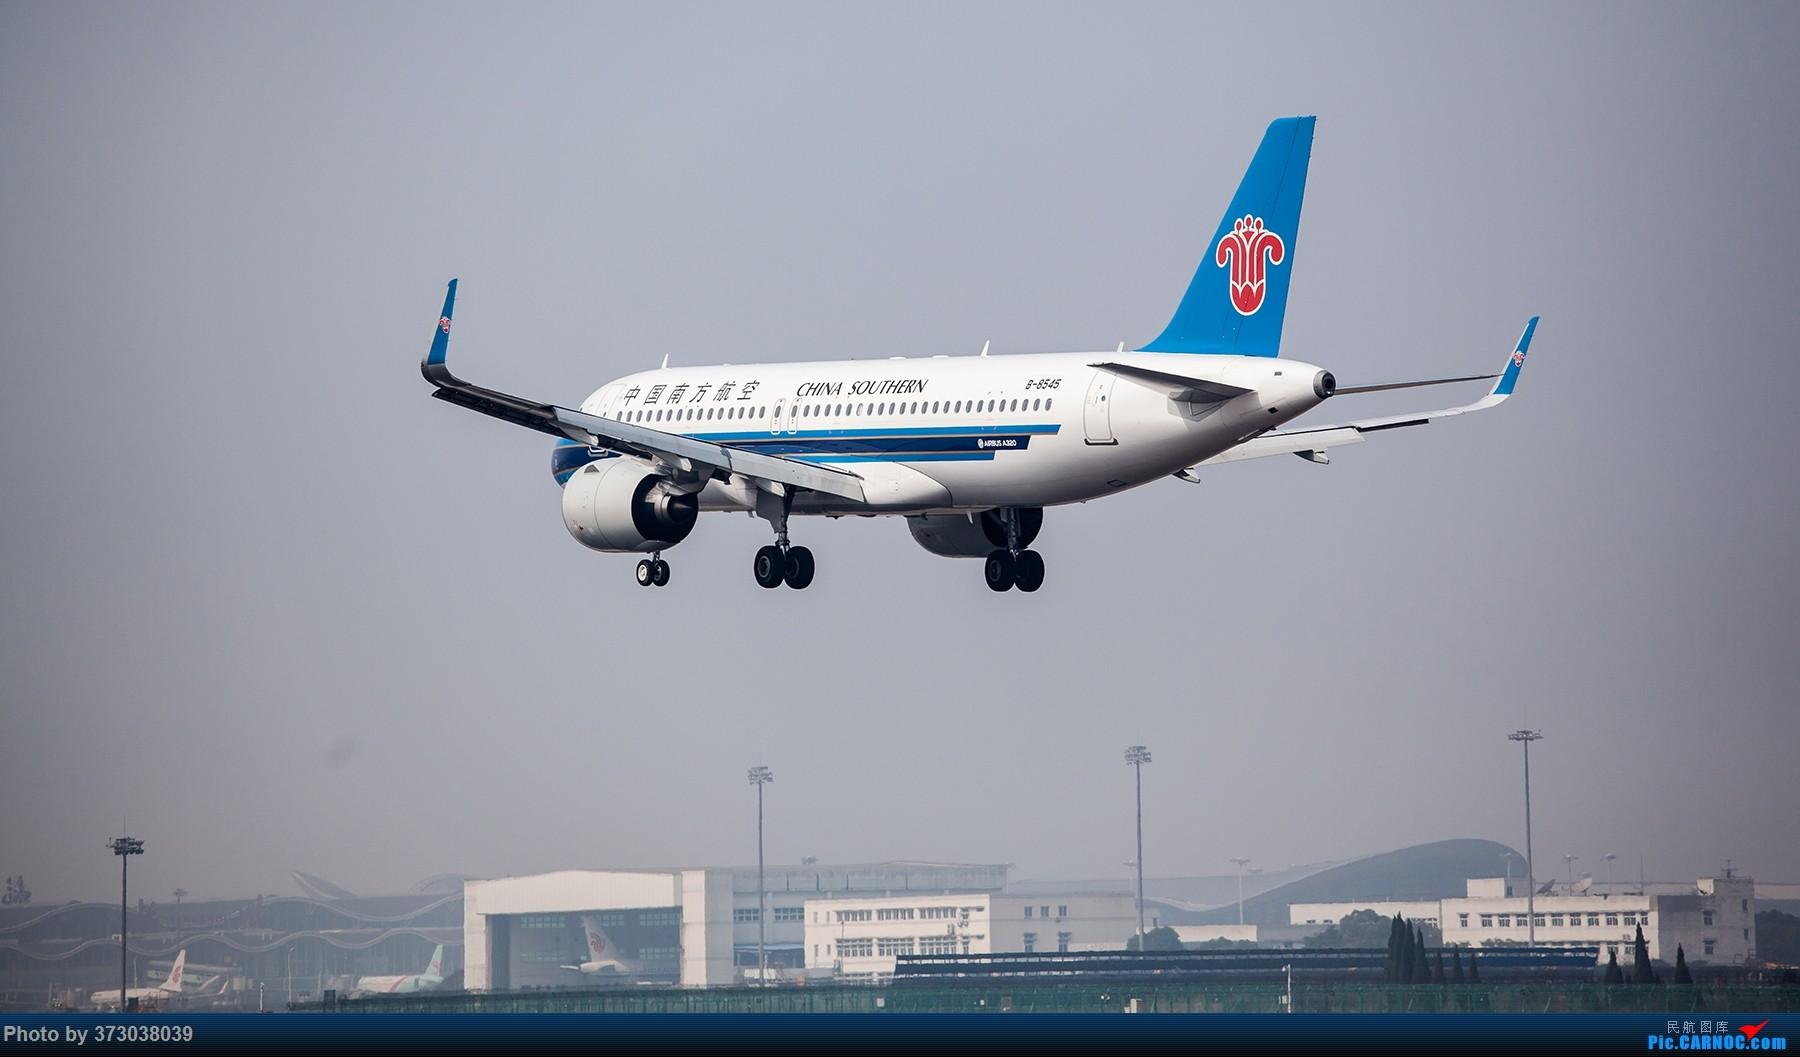 Re:[原创]【杭州飞友会】A320Neo迪士尼杭州萧山机场拍机班门弄斧记 AIRBUS A320NEO B-8545 中国杭州萧山国际机场